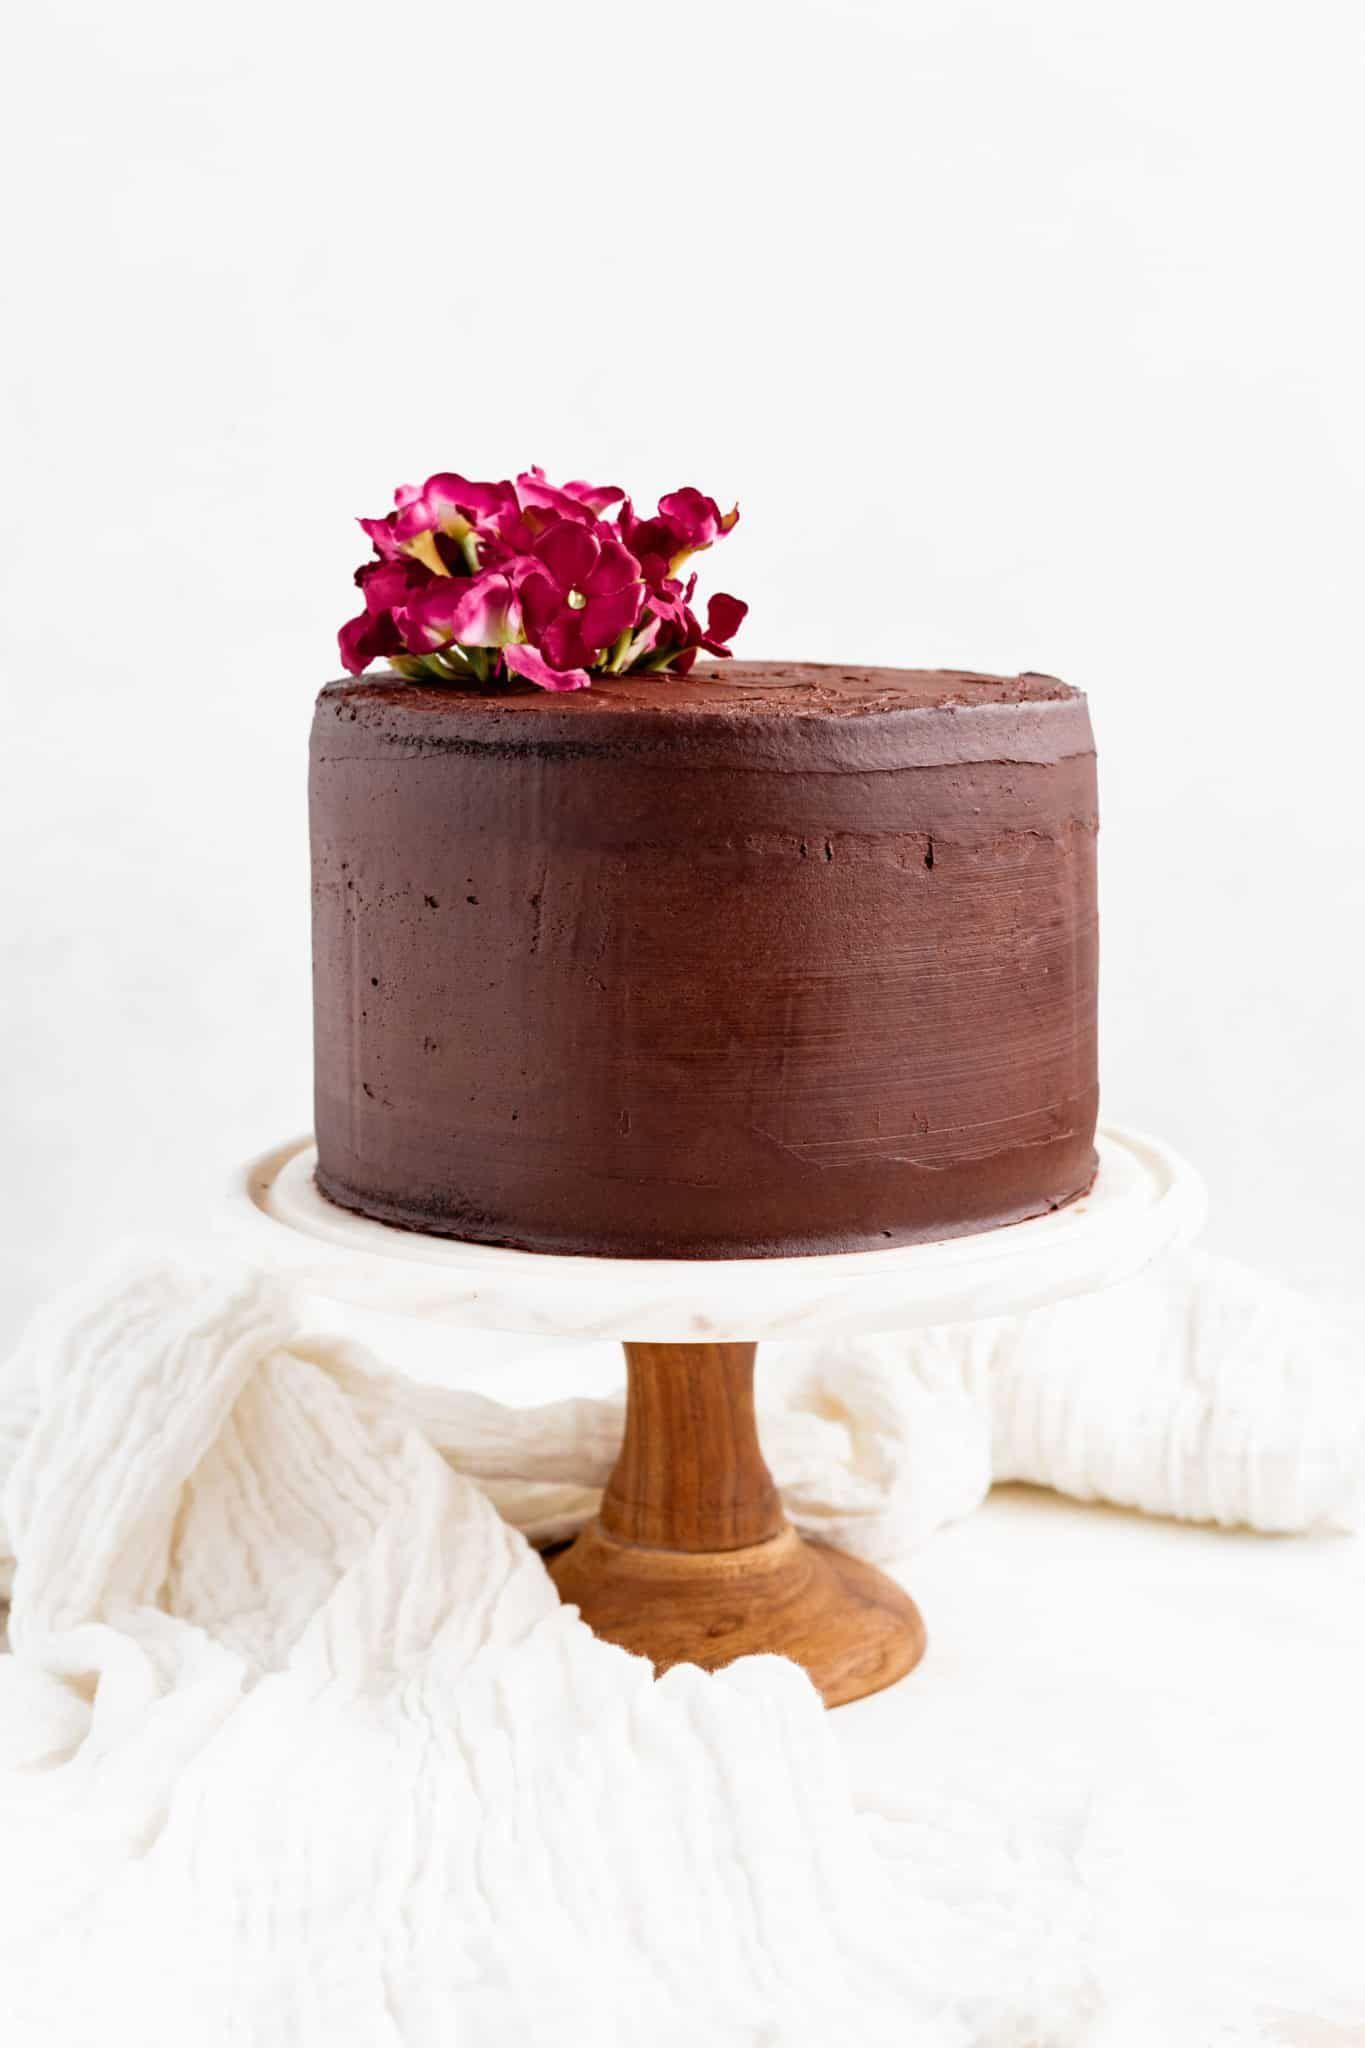 Red Wine Chocolate Cake Baked Ambrosia Recipe In 2020 Red Wine Chocolate Cake Sweet Recipes Cake Recipes